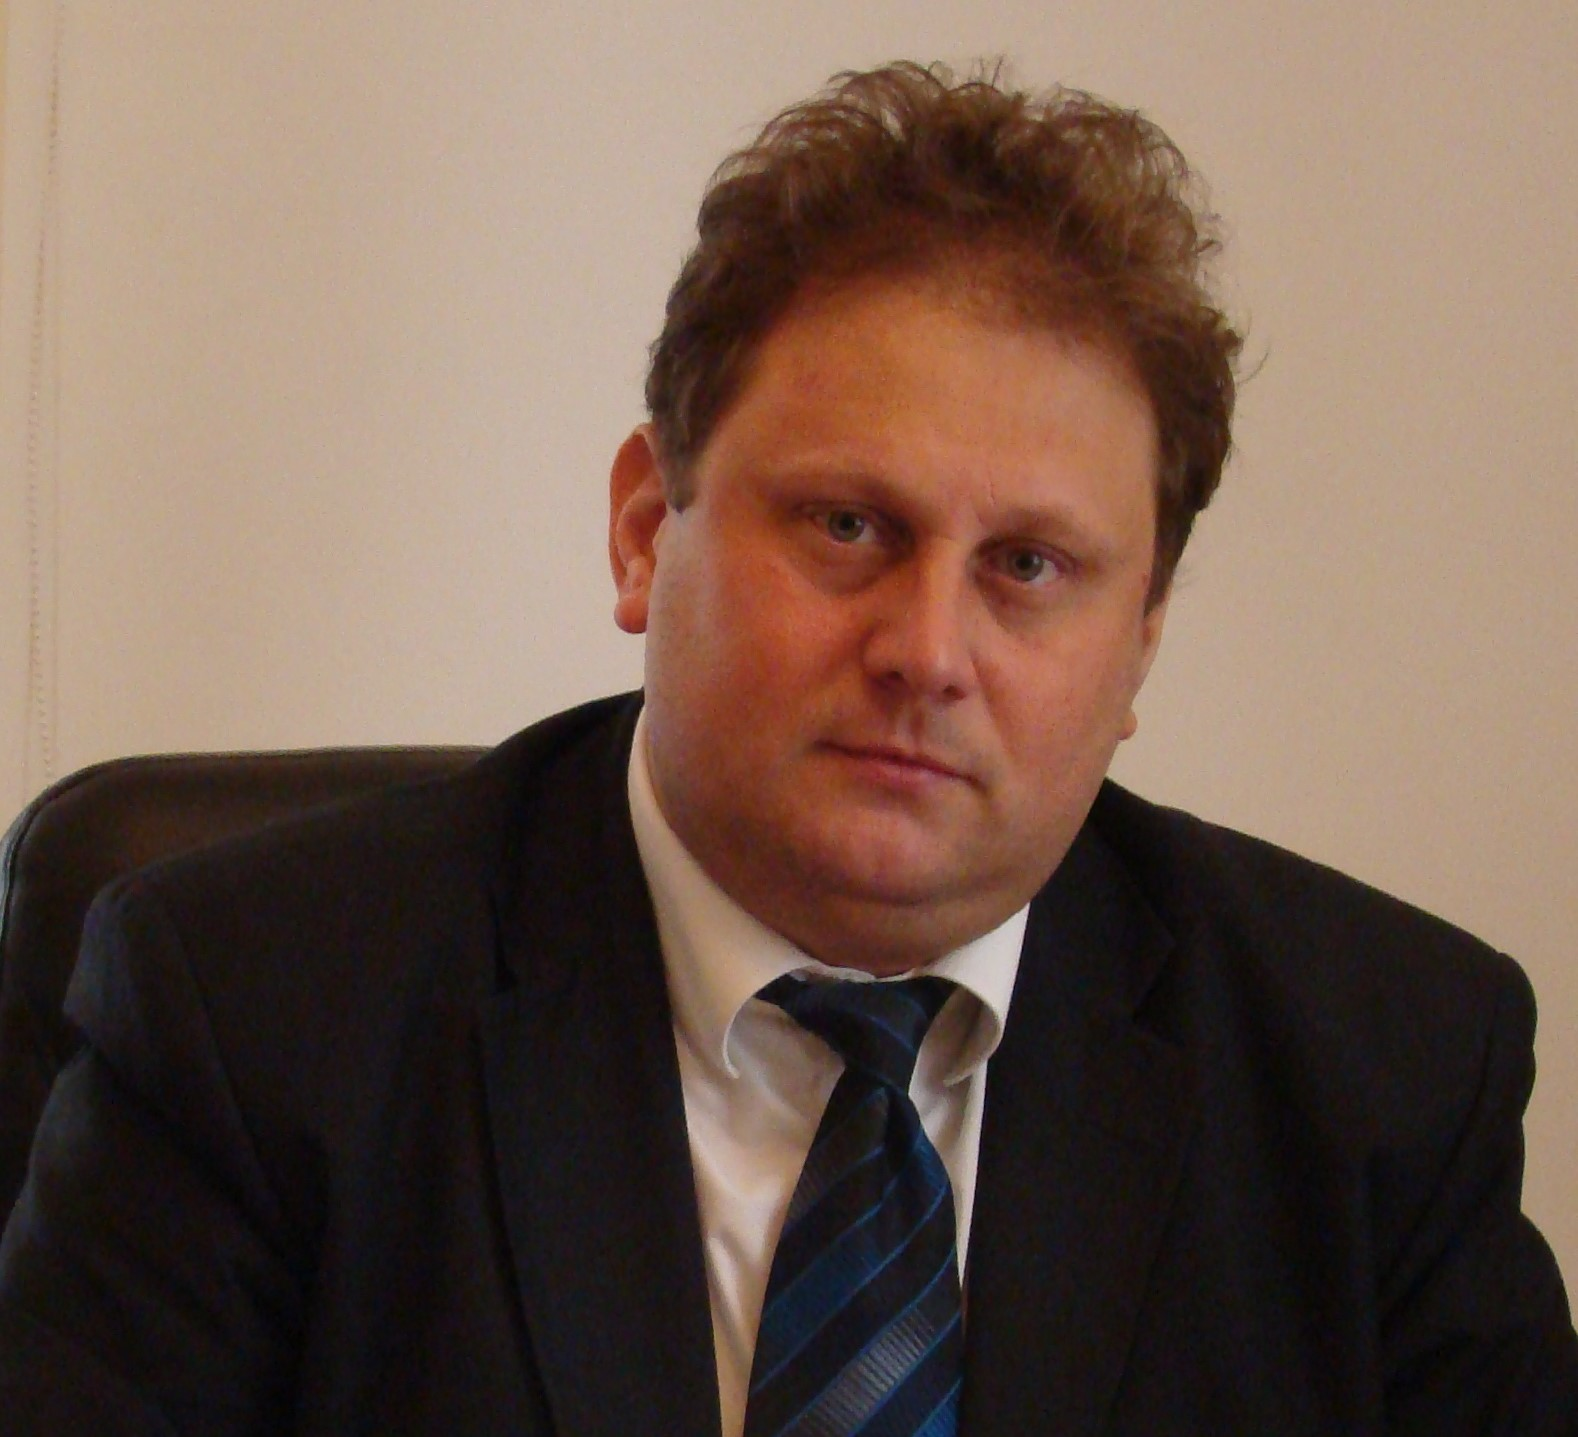 Liviu-Marius Cîrțînă